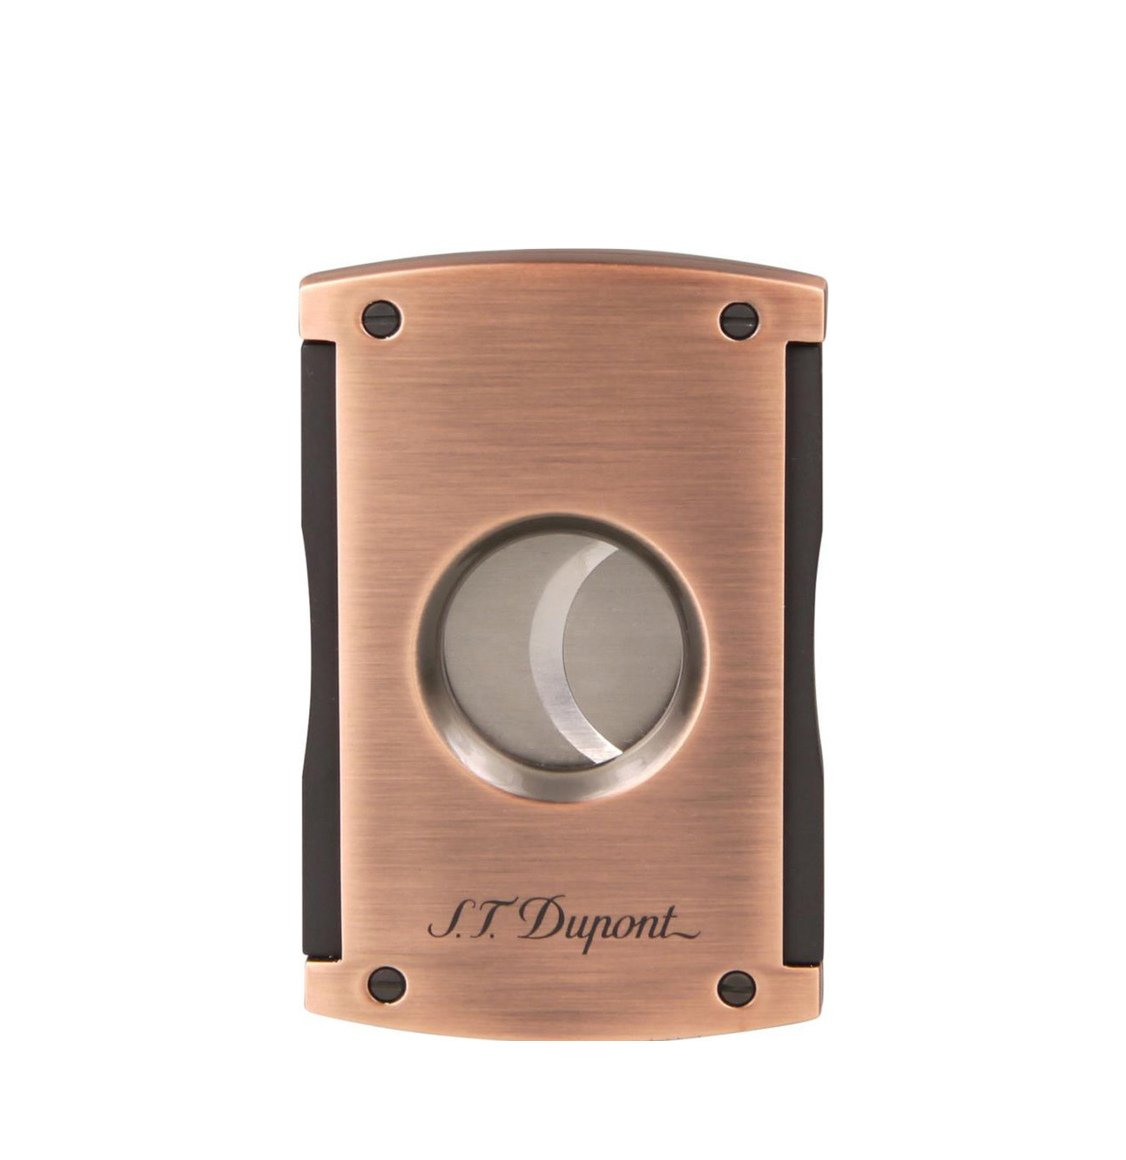 S.T. Dupont Πουροκόφτης Maxijet Copper